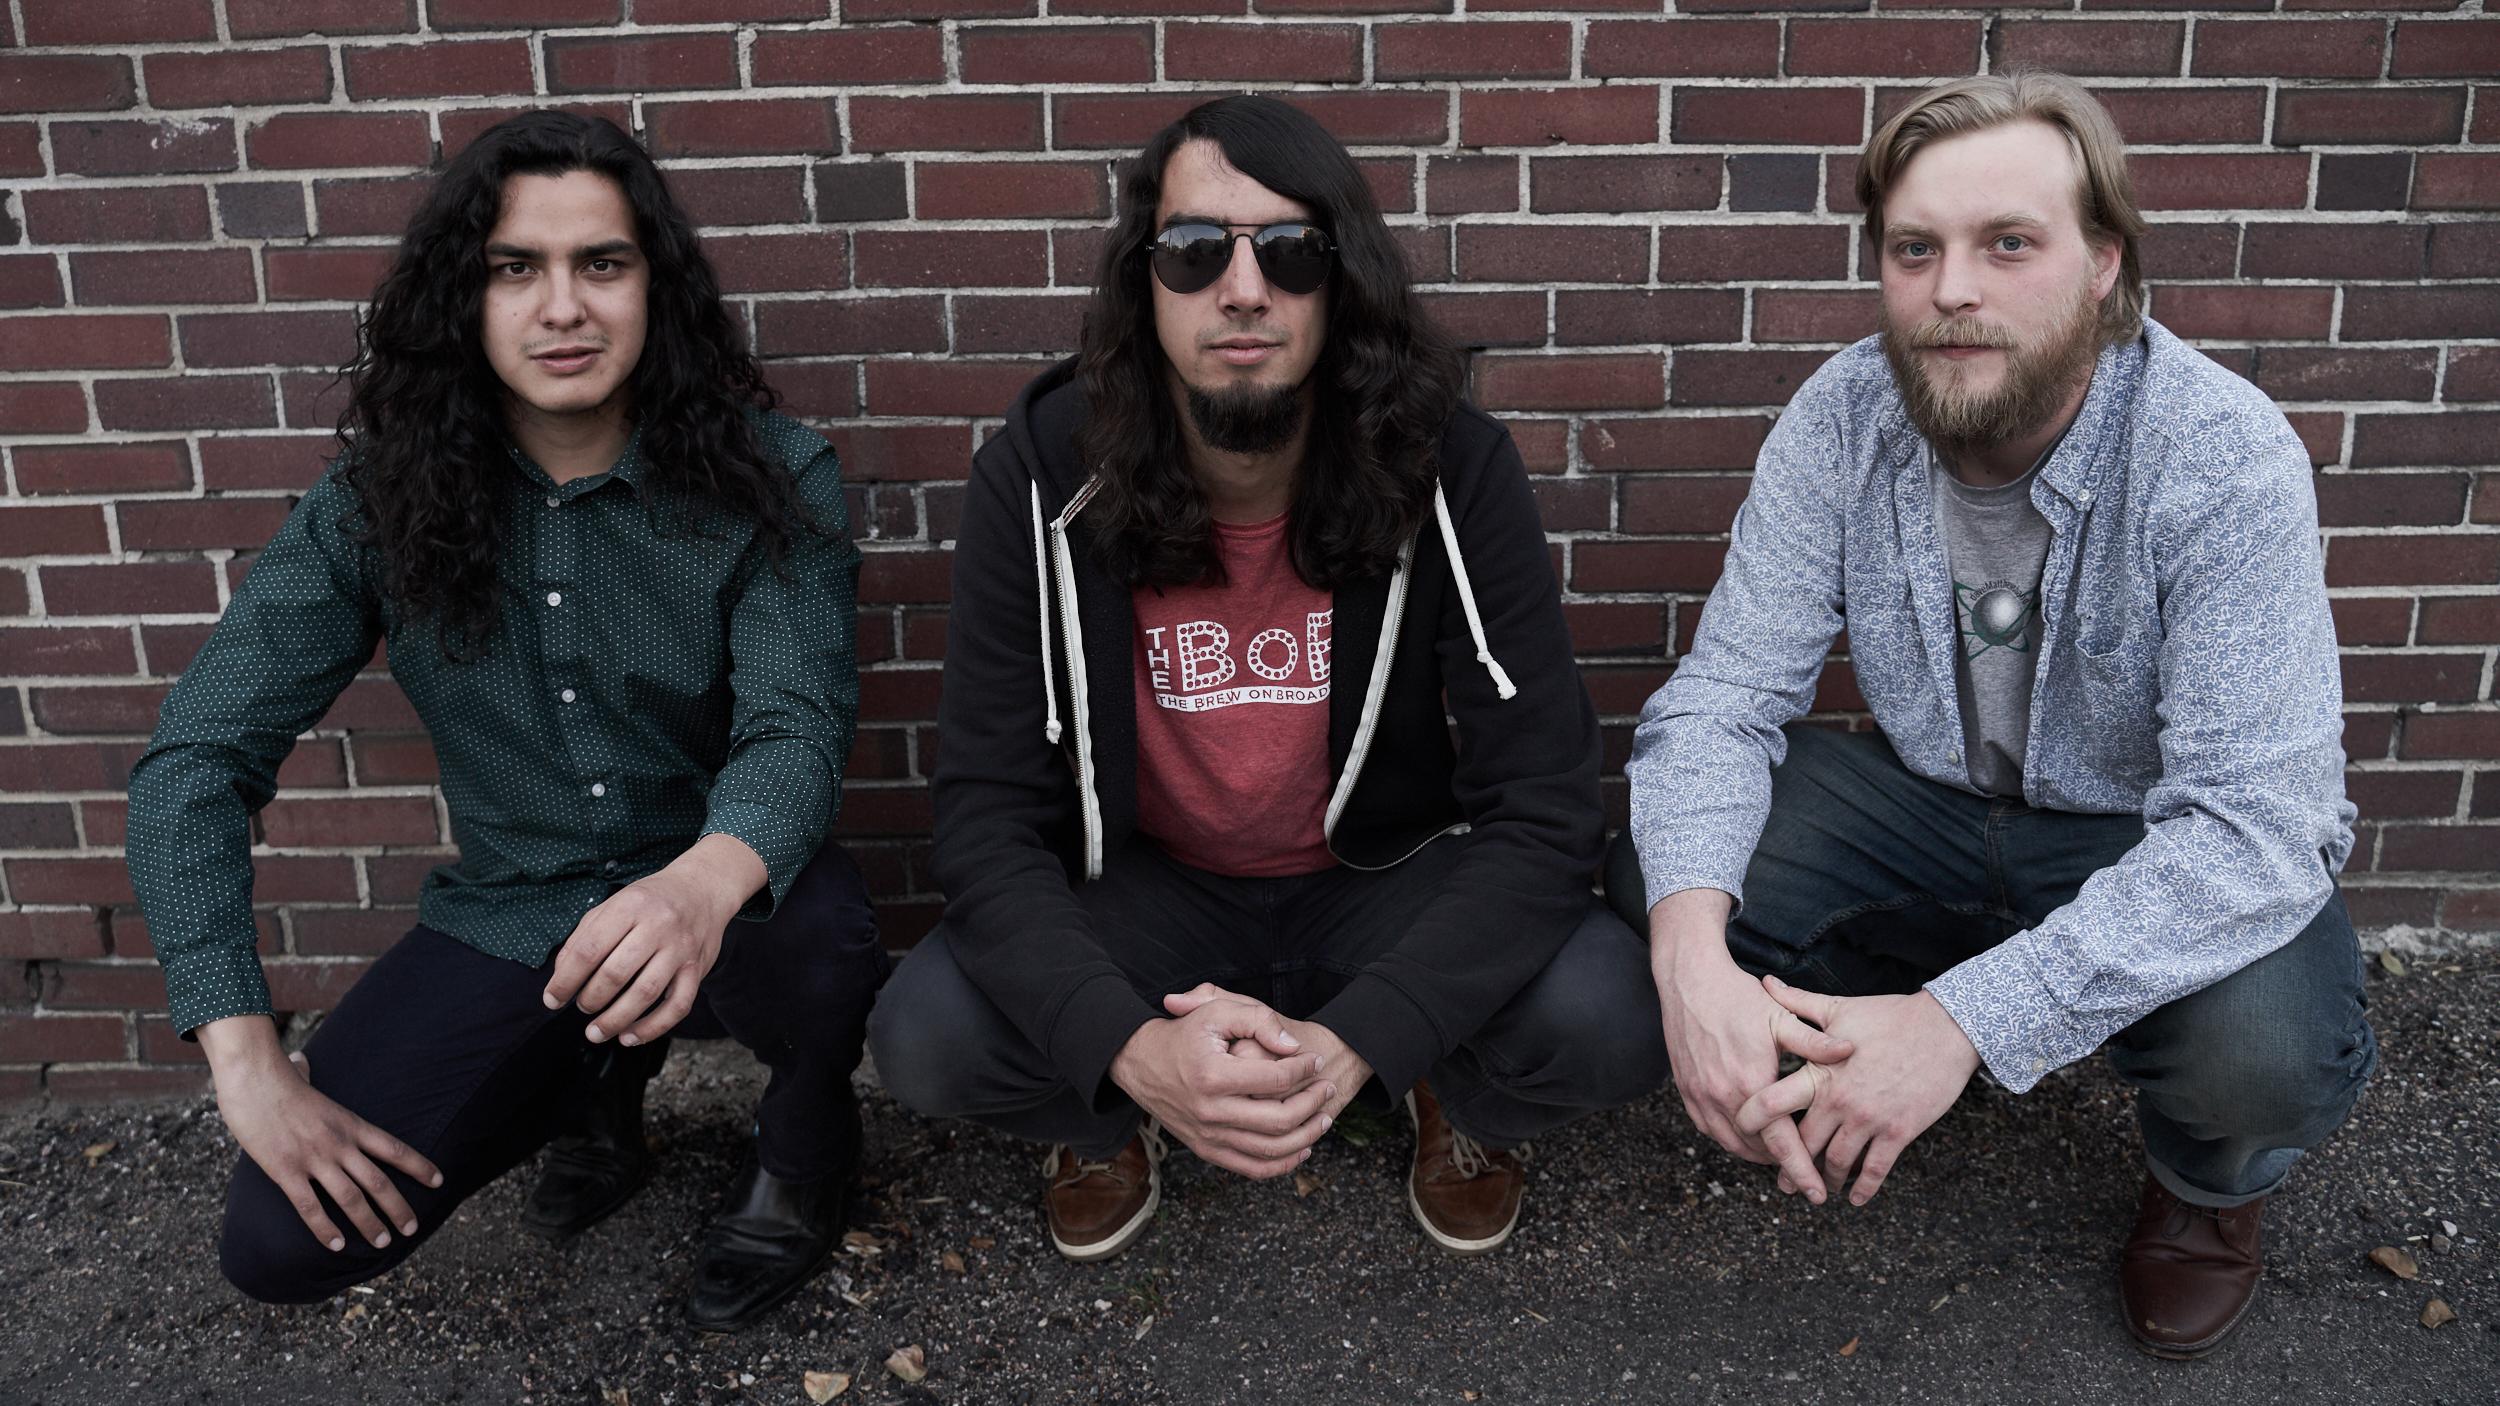 Band Headshots // Denver, CO // May 2019